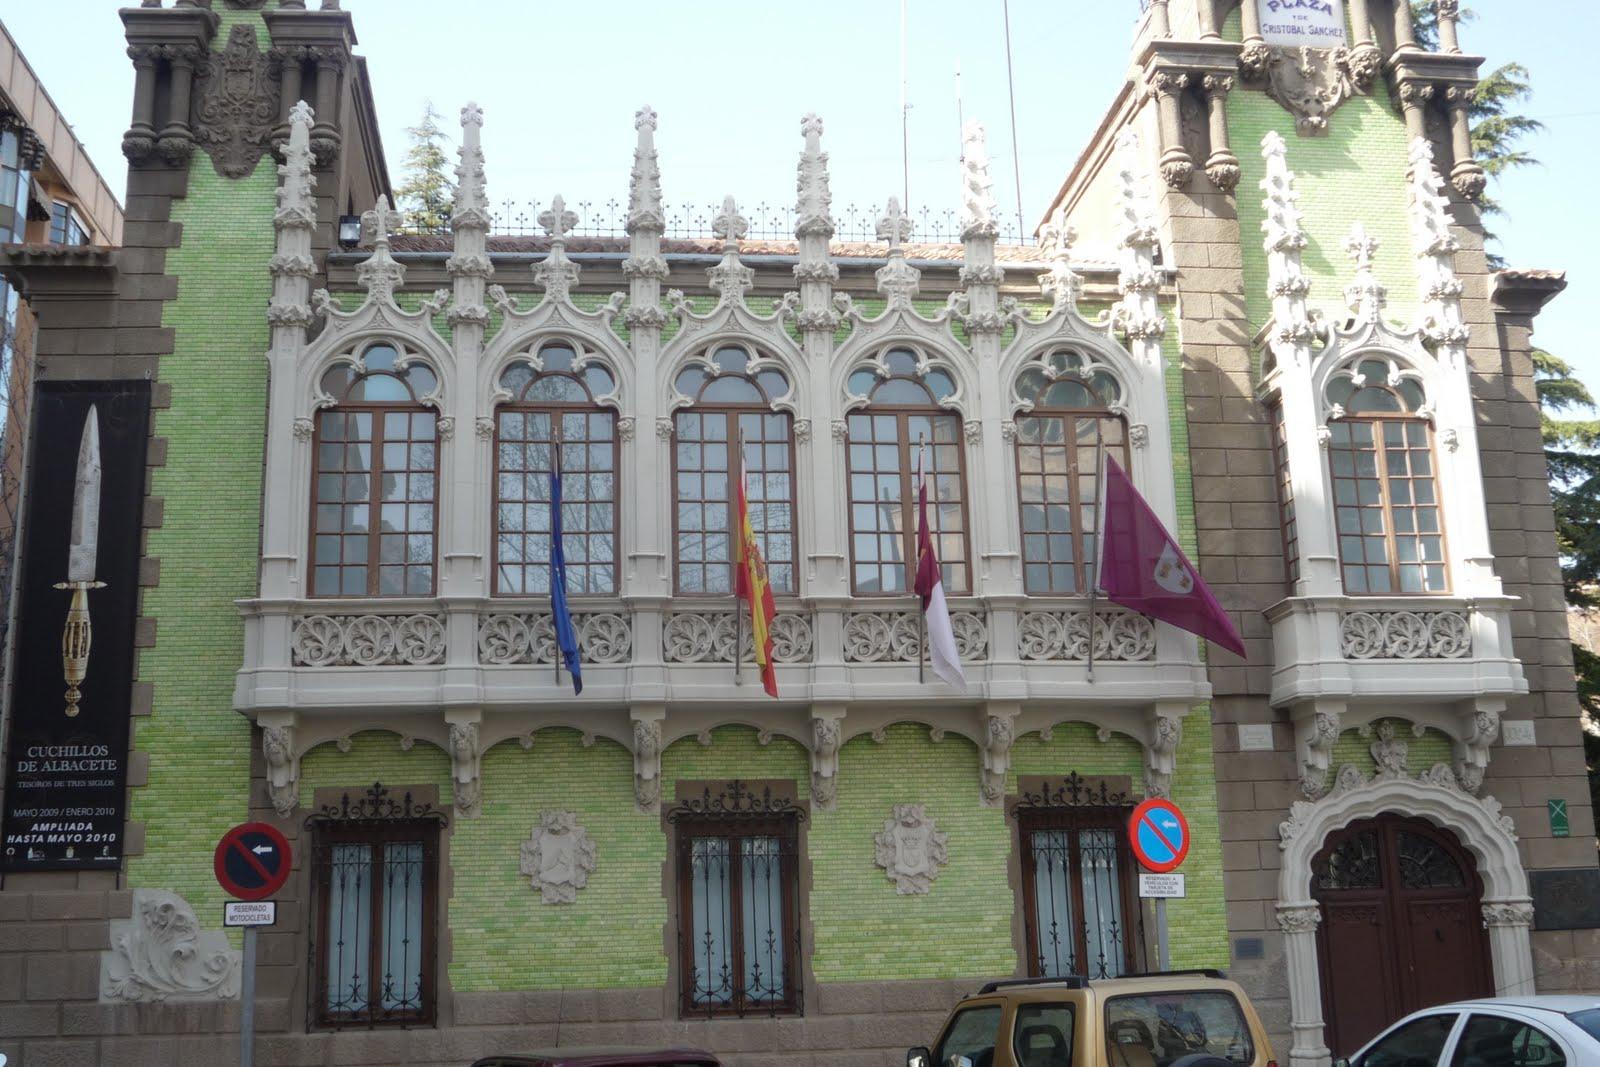 Casa del Hortelano ad Albacete